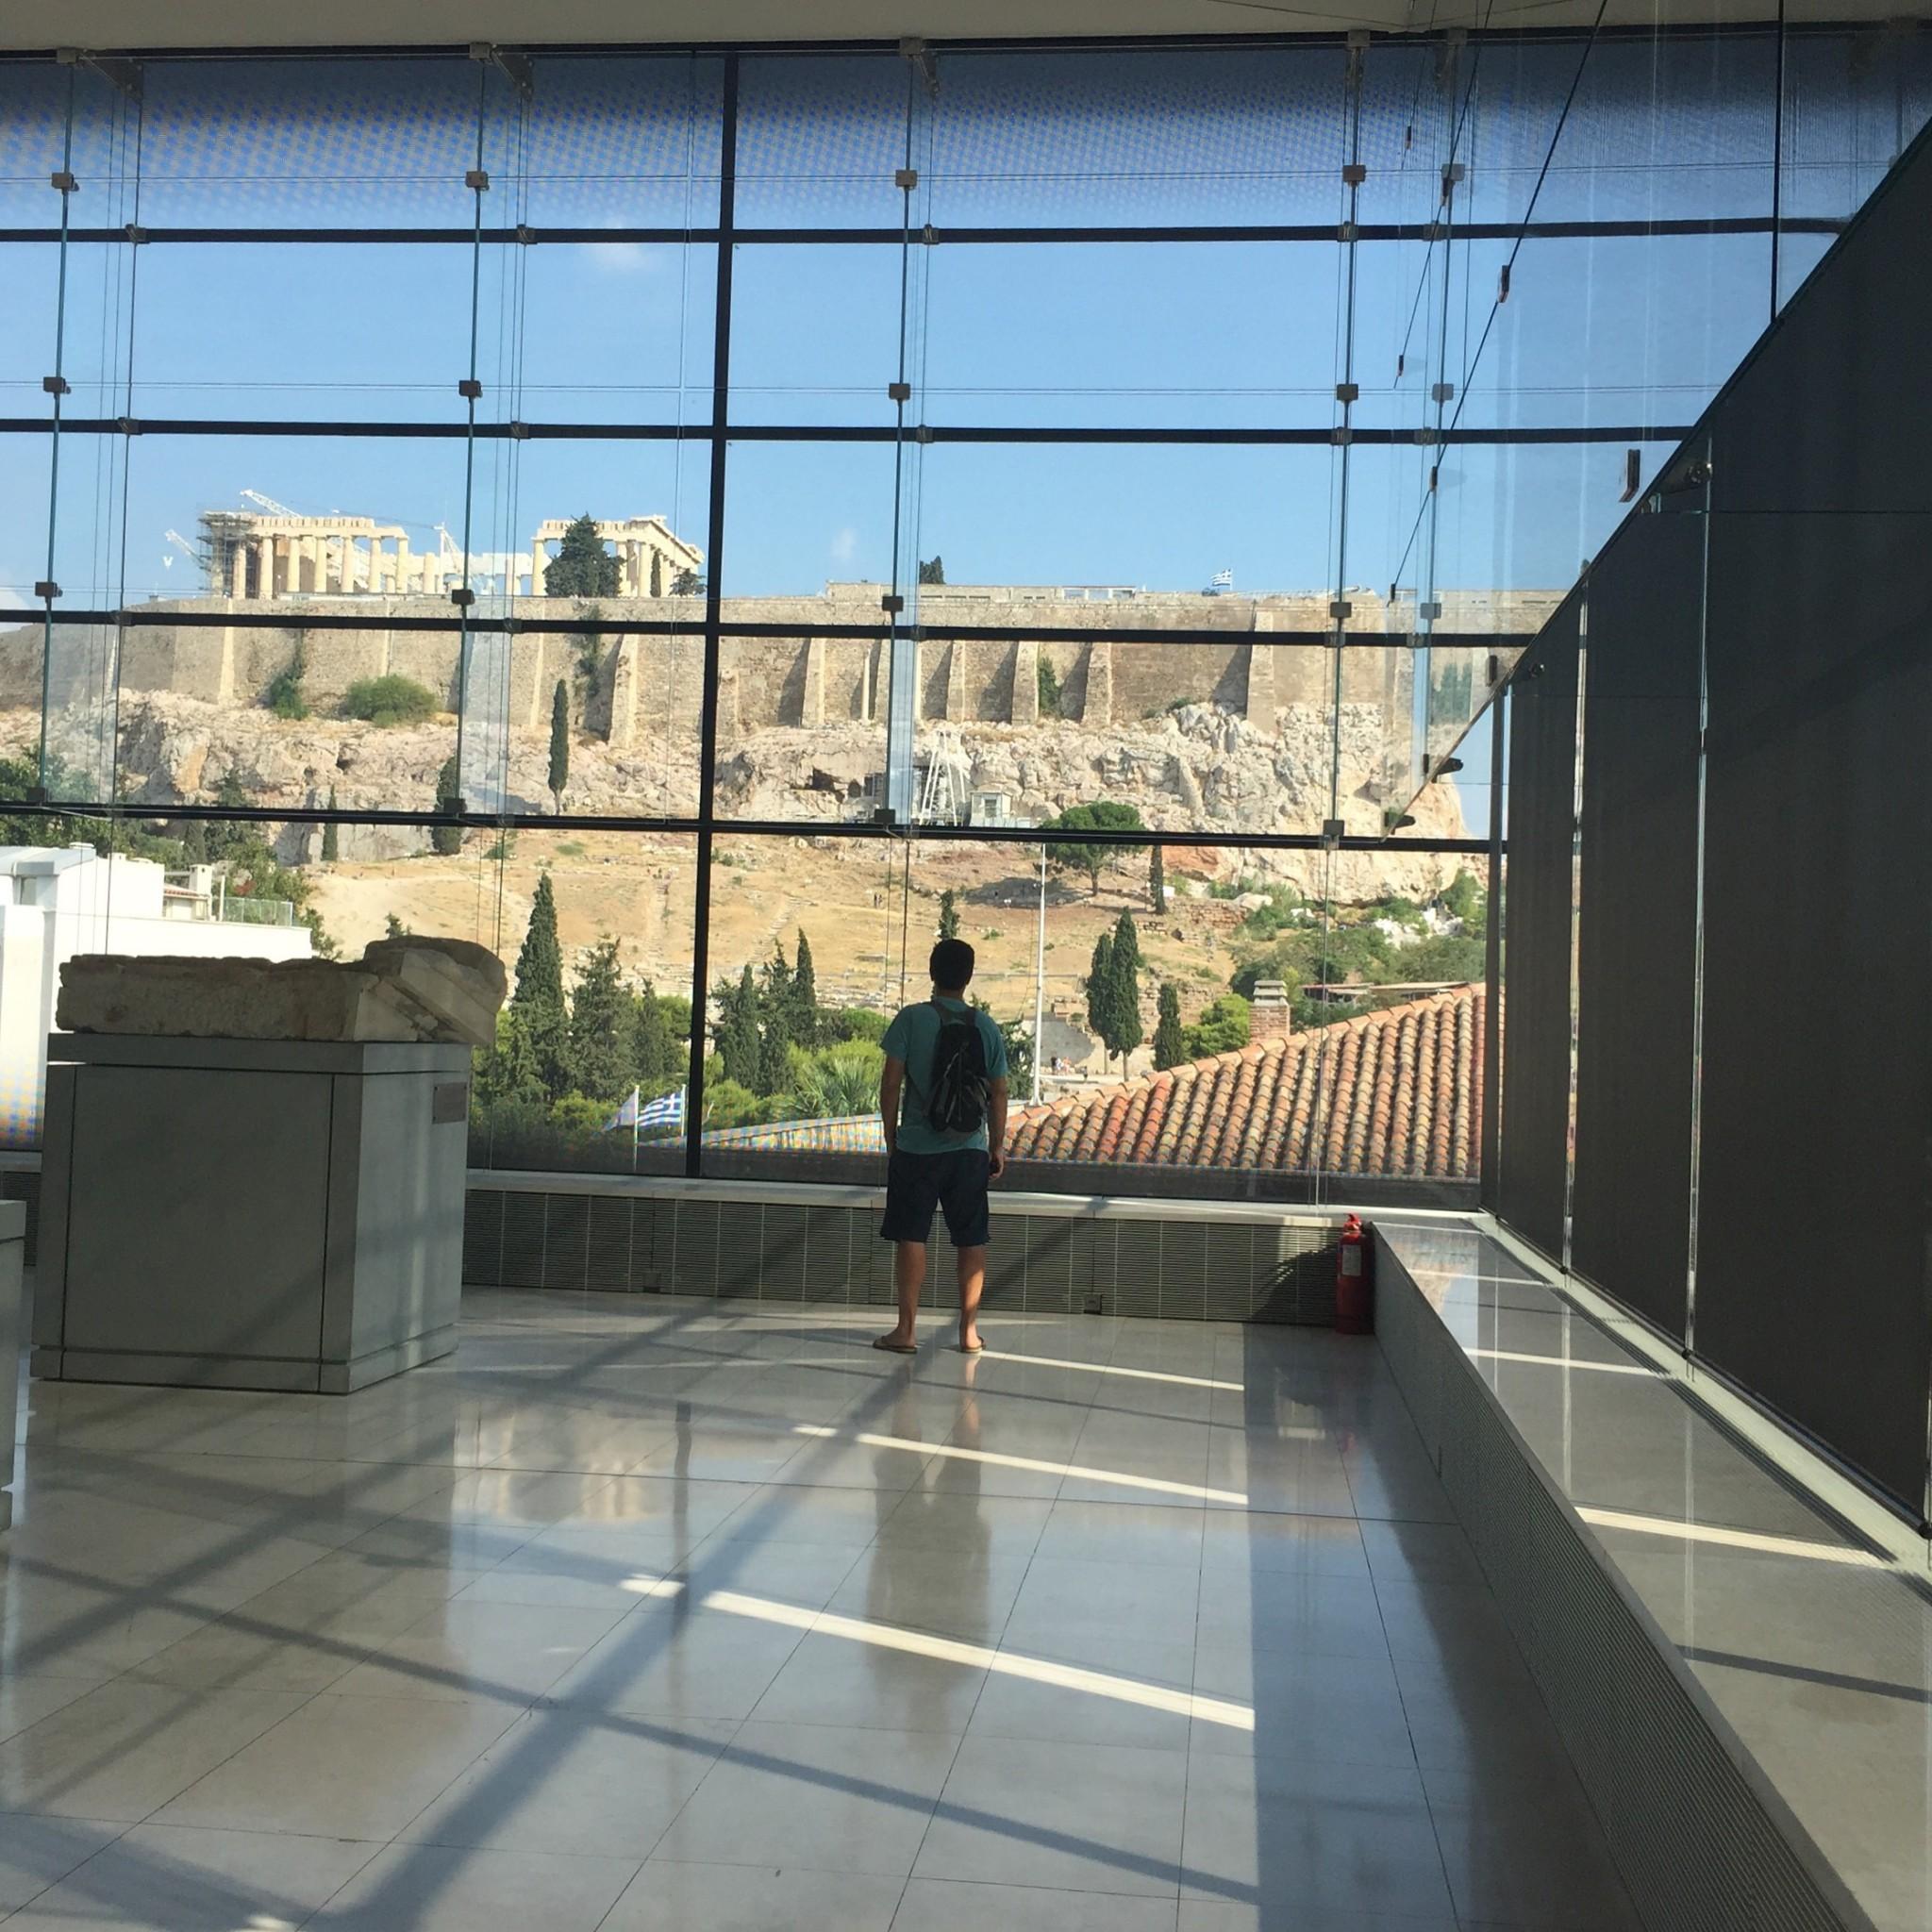 Athens Travel Guide letsregale.com 25